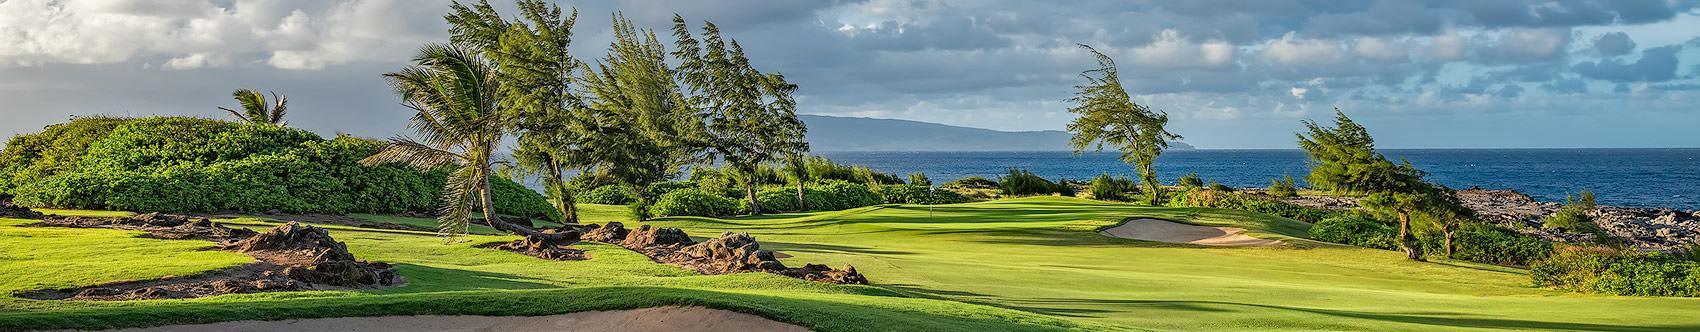 <div class='title'>           4TH HOLE, KAPALUA'S BAY COURSE         </div>                 <div class='description'>           My favorite shot from a Fall 2015 shoot at Kapalua's Bay Course, on Maui         </div>